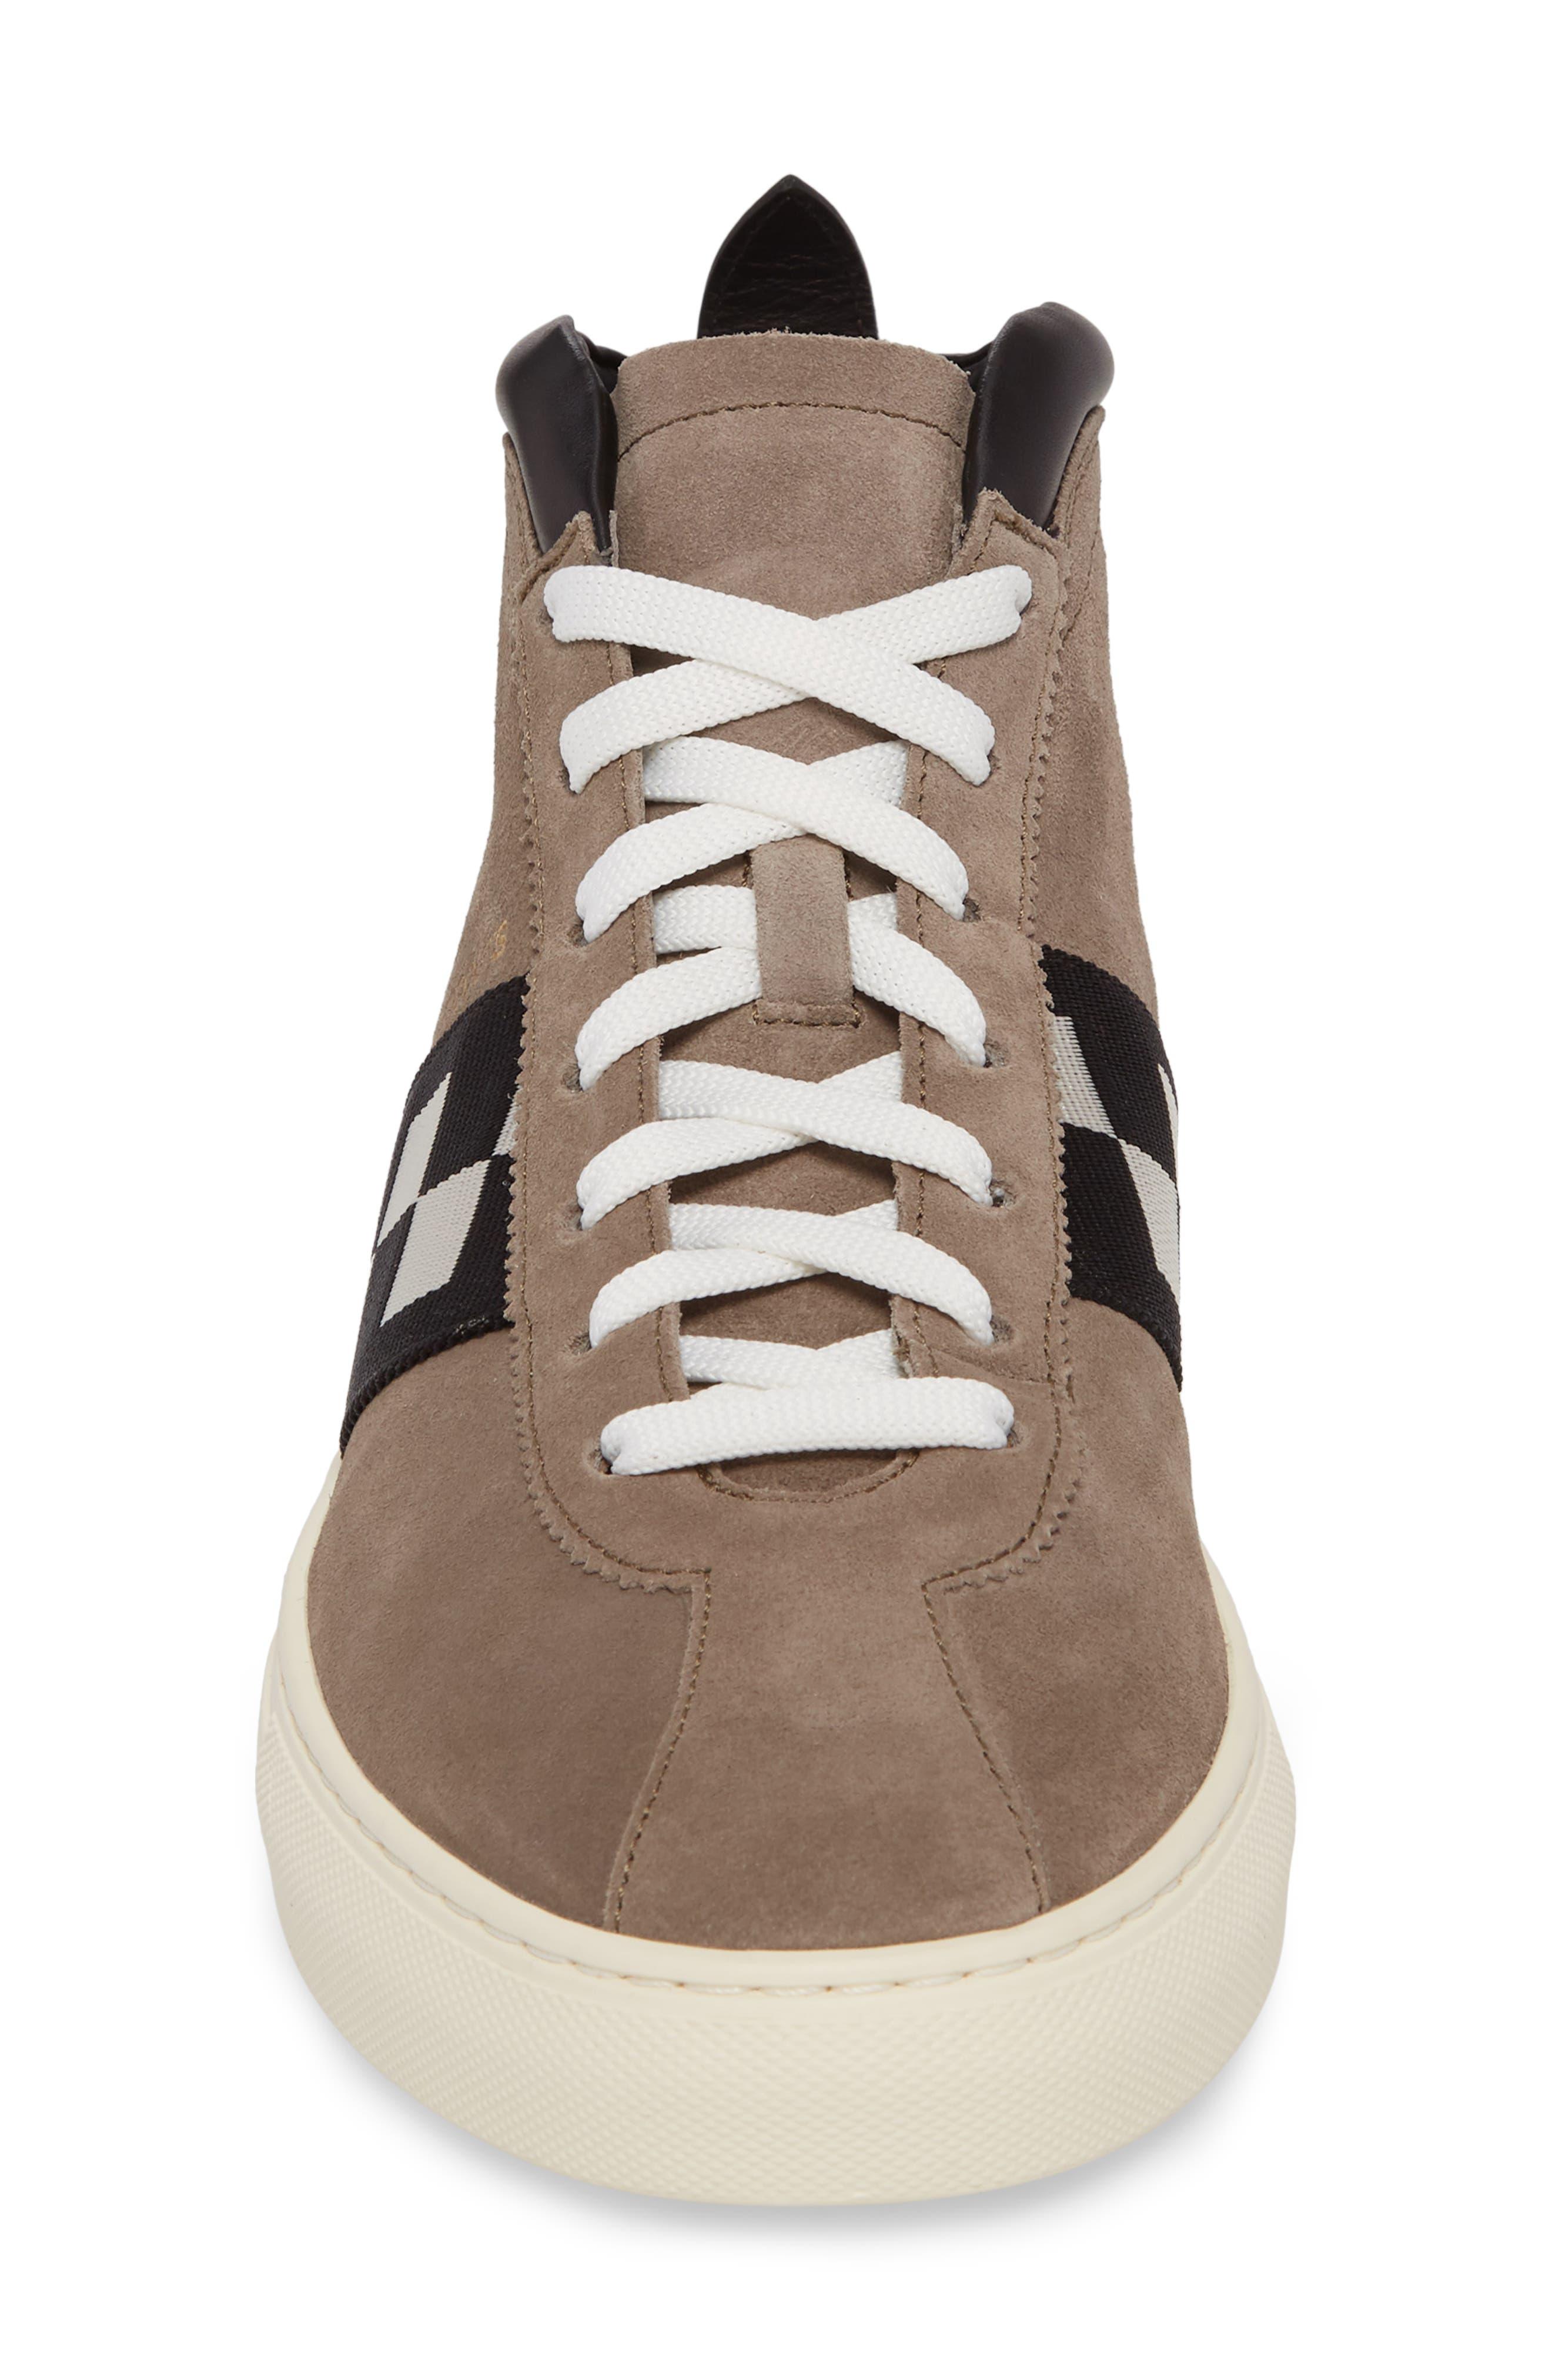 Vita Checkered High Top Sneaker,                             Alternate thumbnail 4, color,                             Snuff